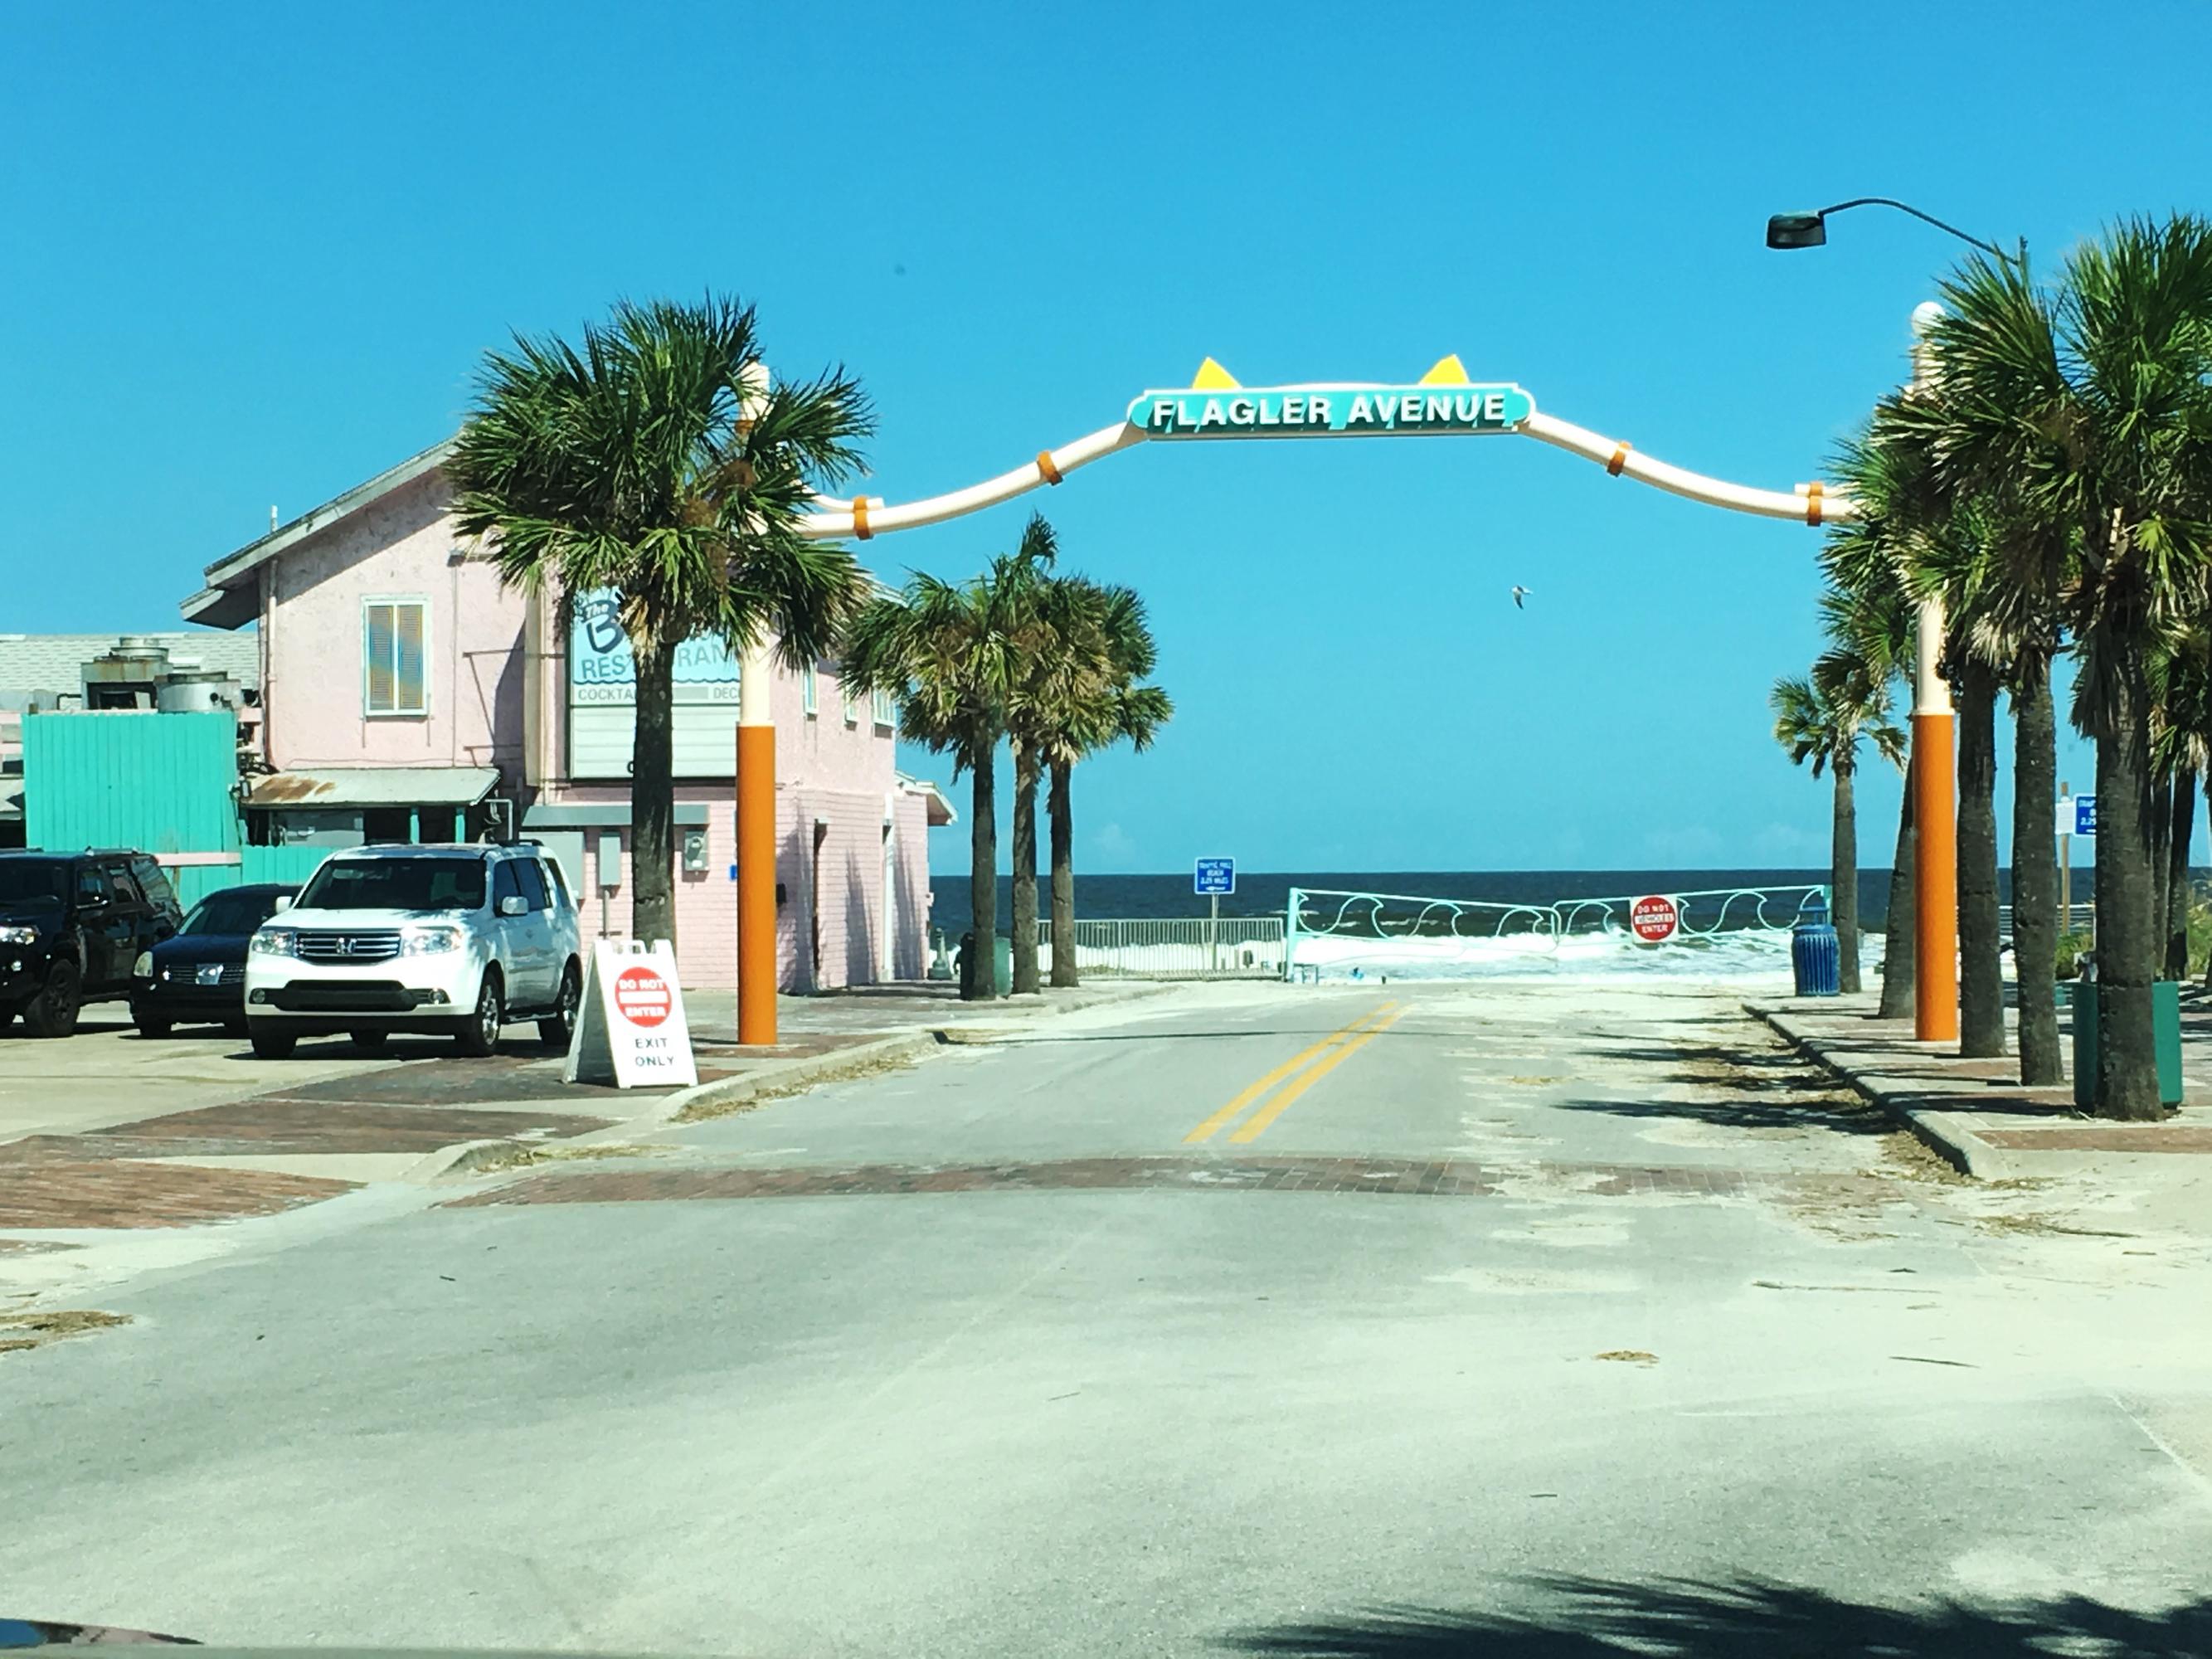 Flagler Ave beach ramp sign and Breakers Restaurant